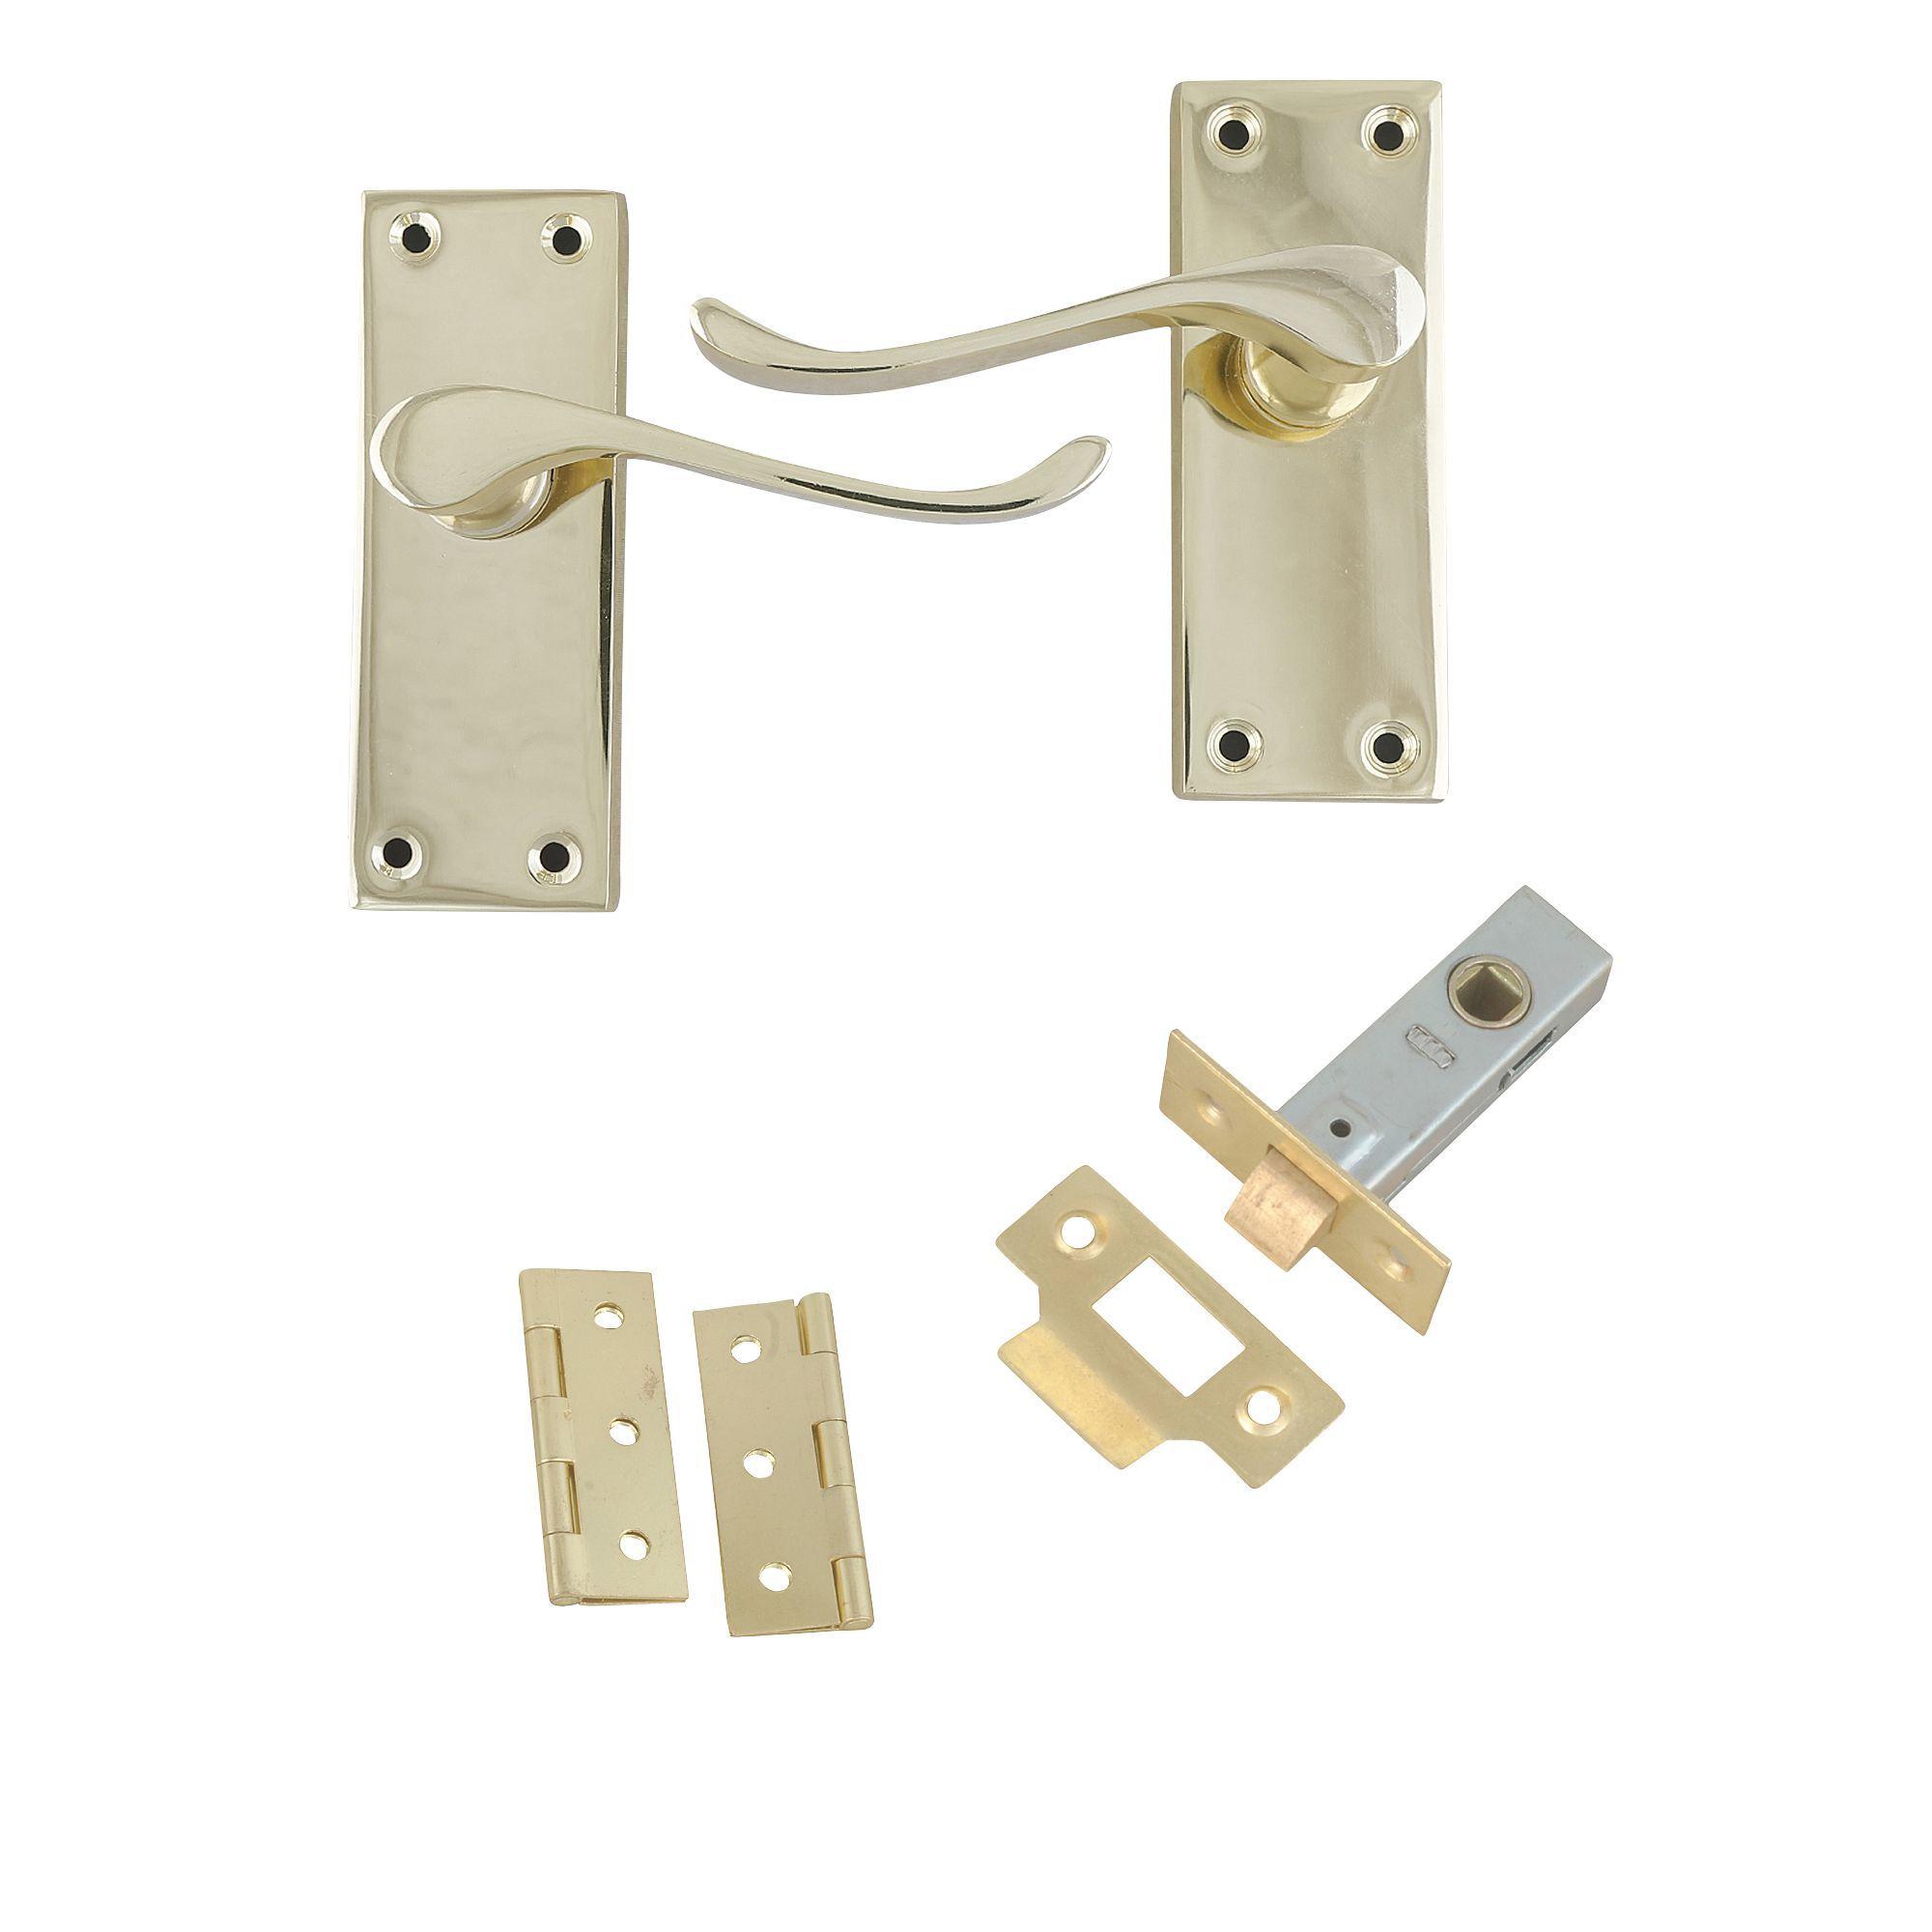 Polished Brass Effect Internal Scroll Latch Door Handle, 1 Set